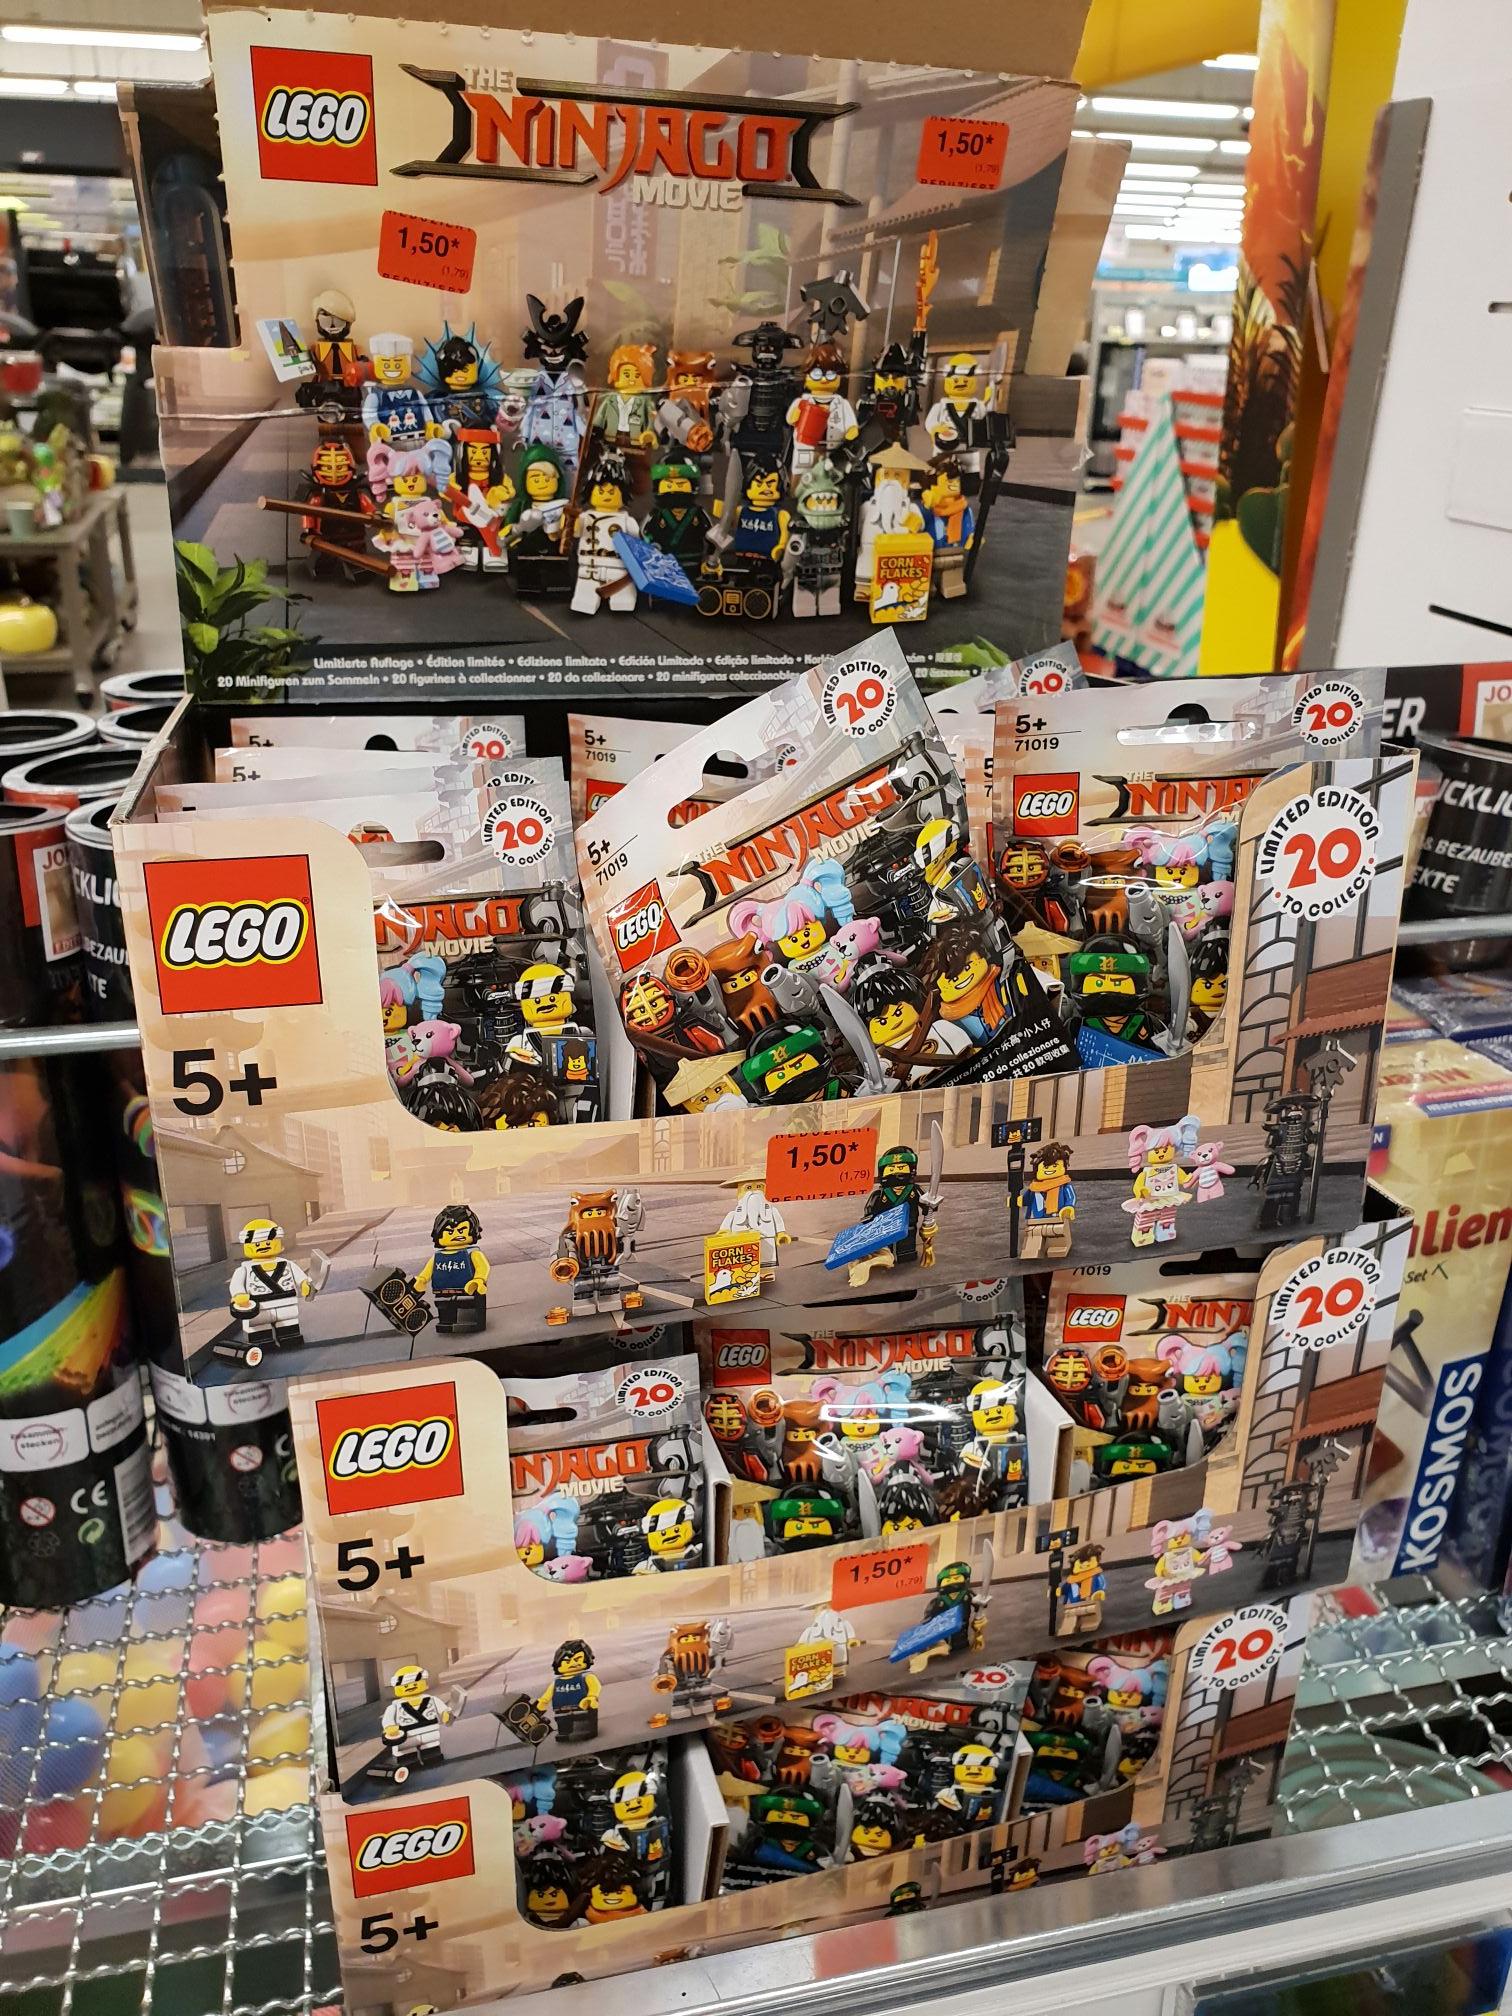 [Lokal] Metro Berlin Friedrichshain Lego Ninjago Movie Minifigur Figur Film